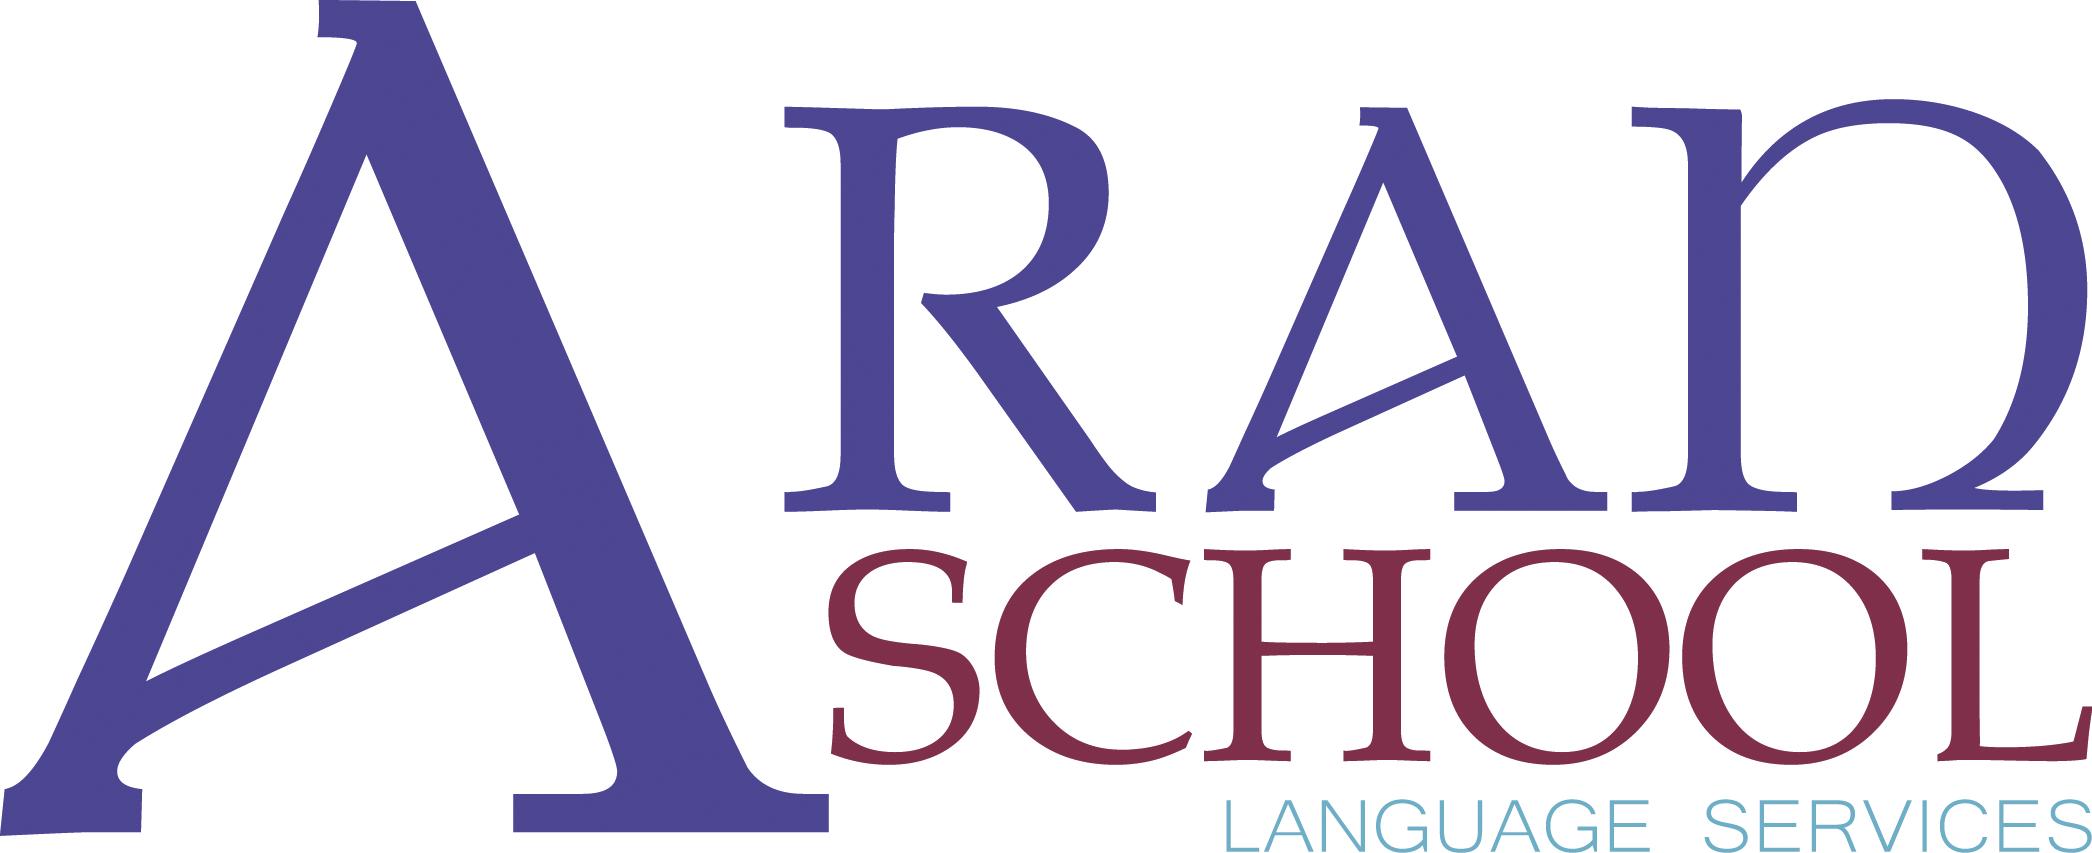 ARAN SCHOOL